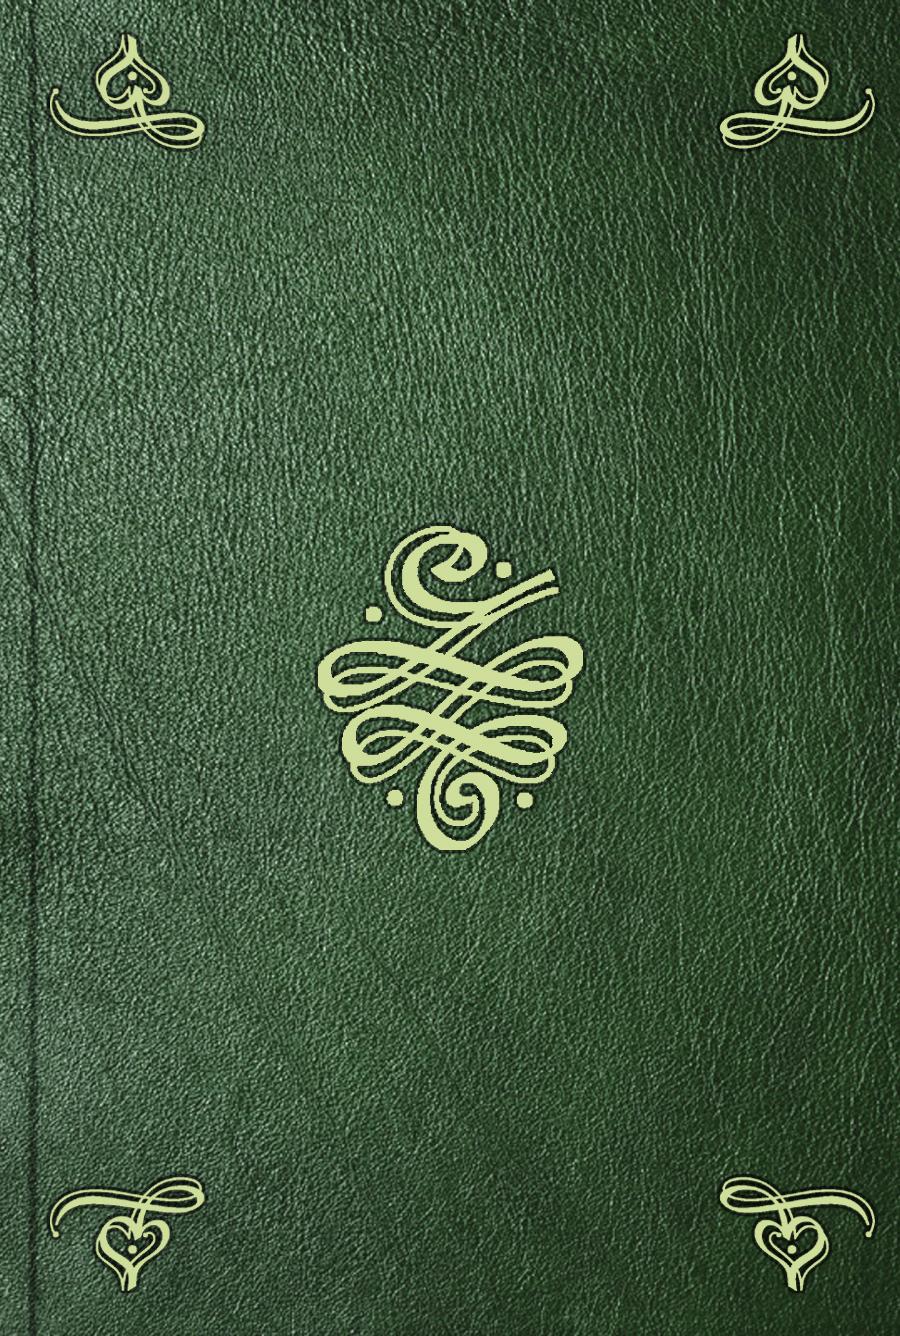 Фото - Рене Декарт Oeuvres de Descartes. T. 11 декарт рене декарт собрание сочинений